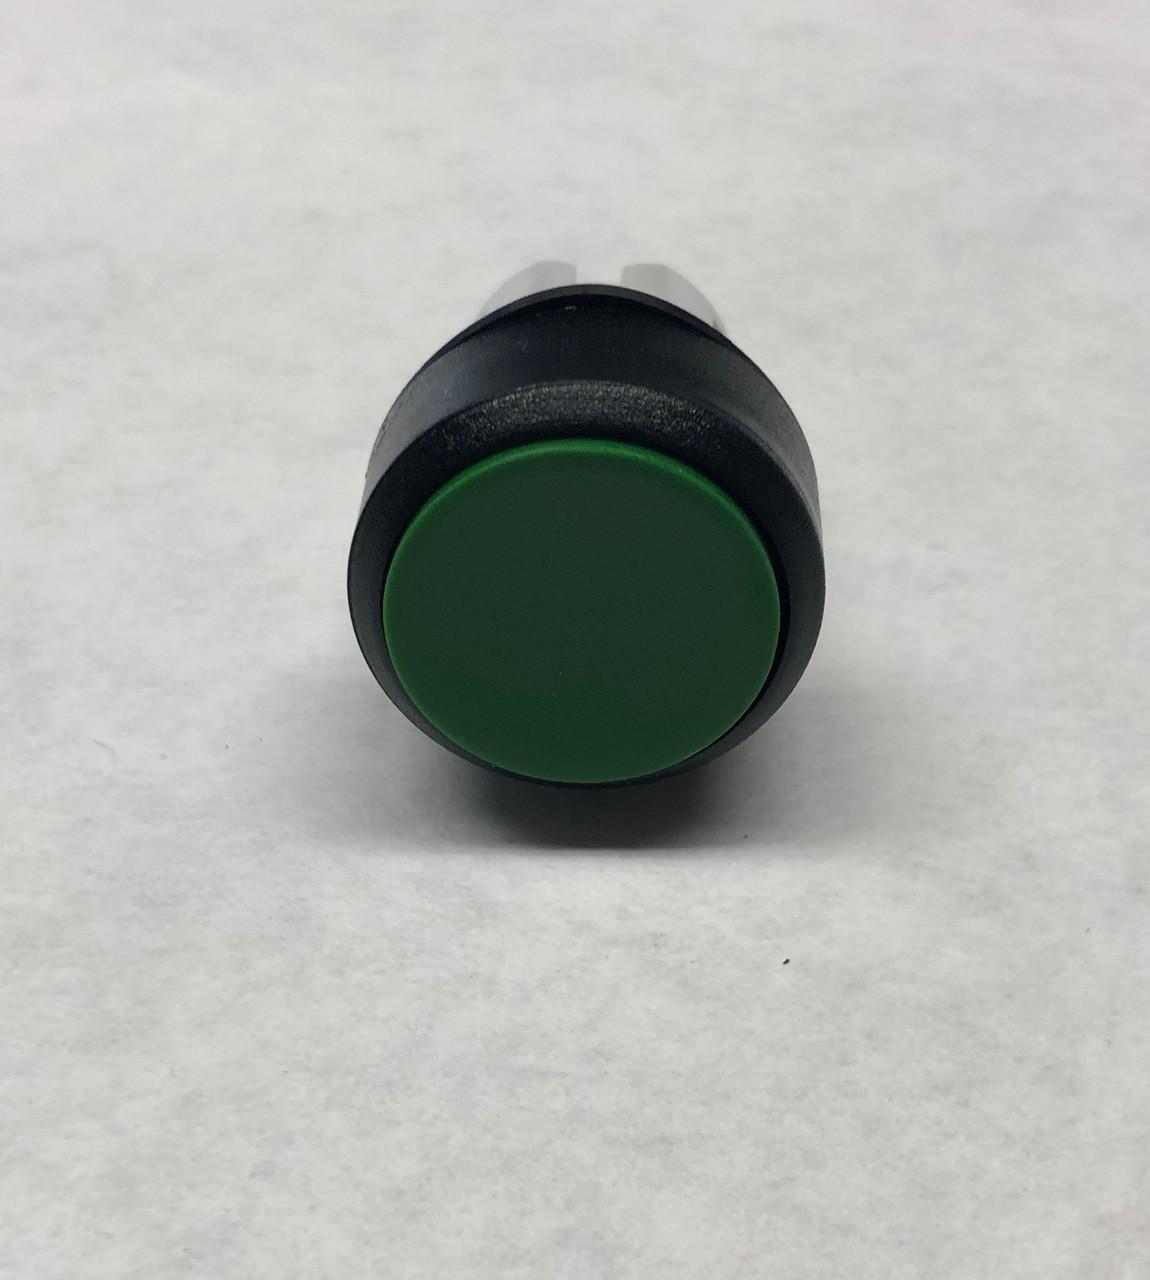 TorRey Model M32 - Green Button - 05-02261